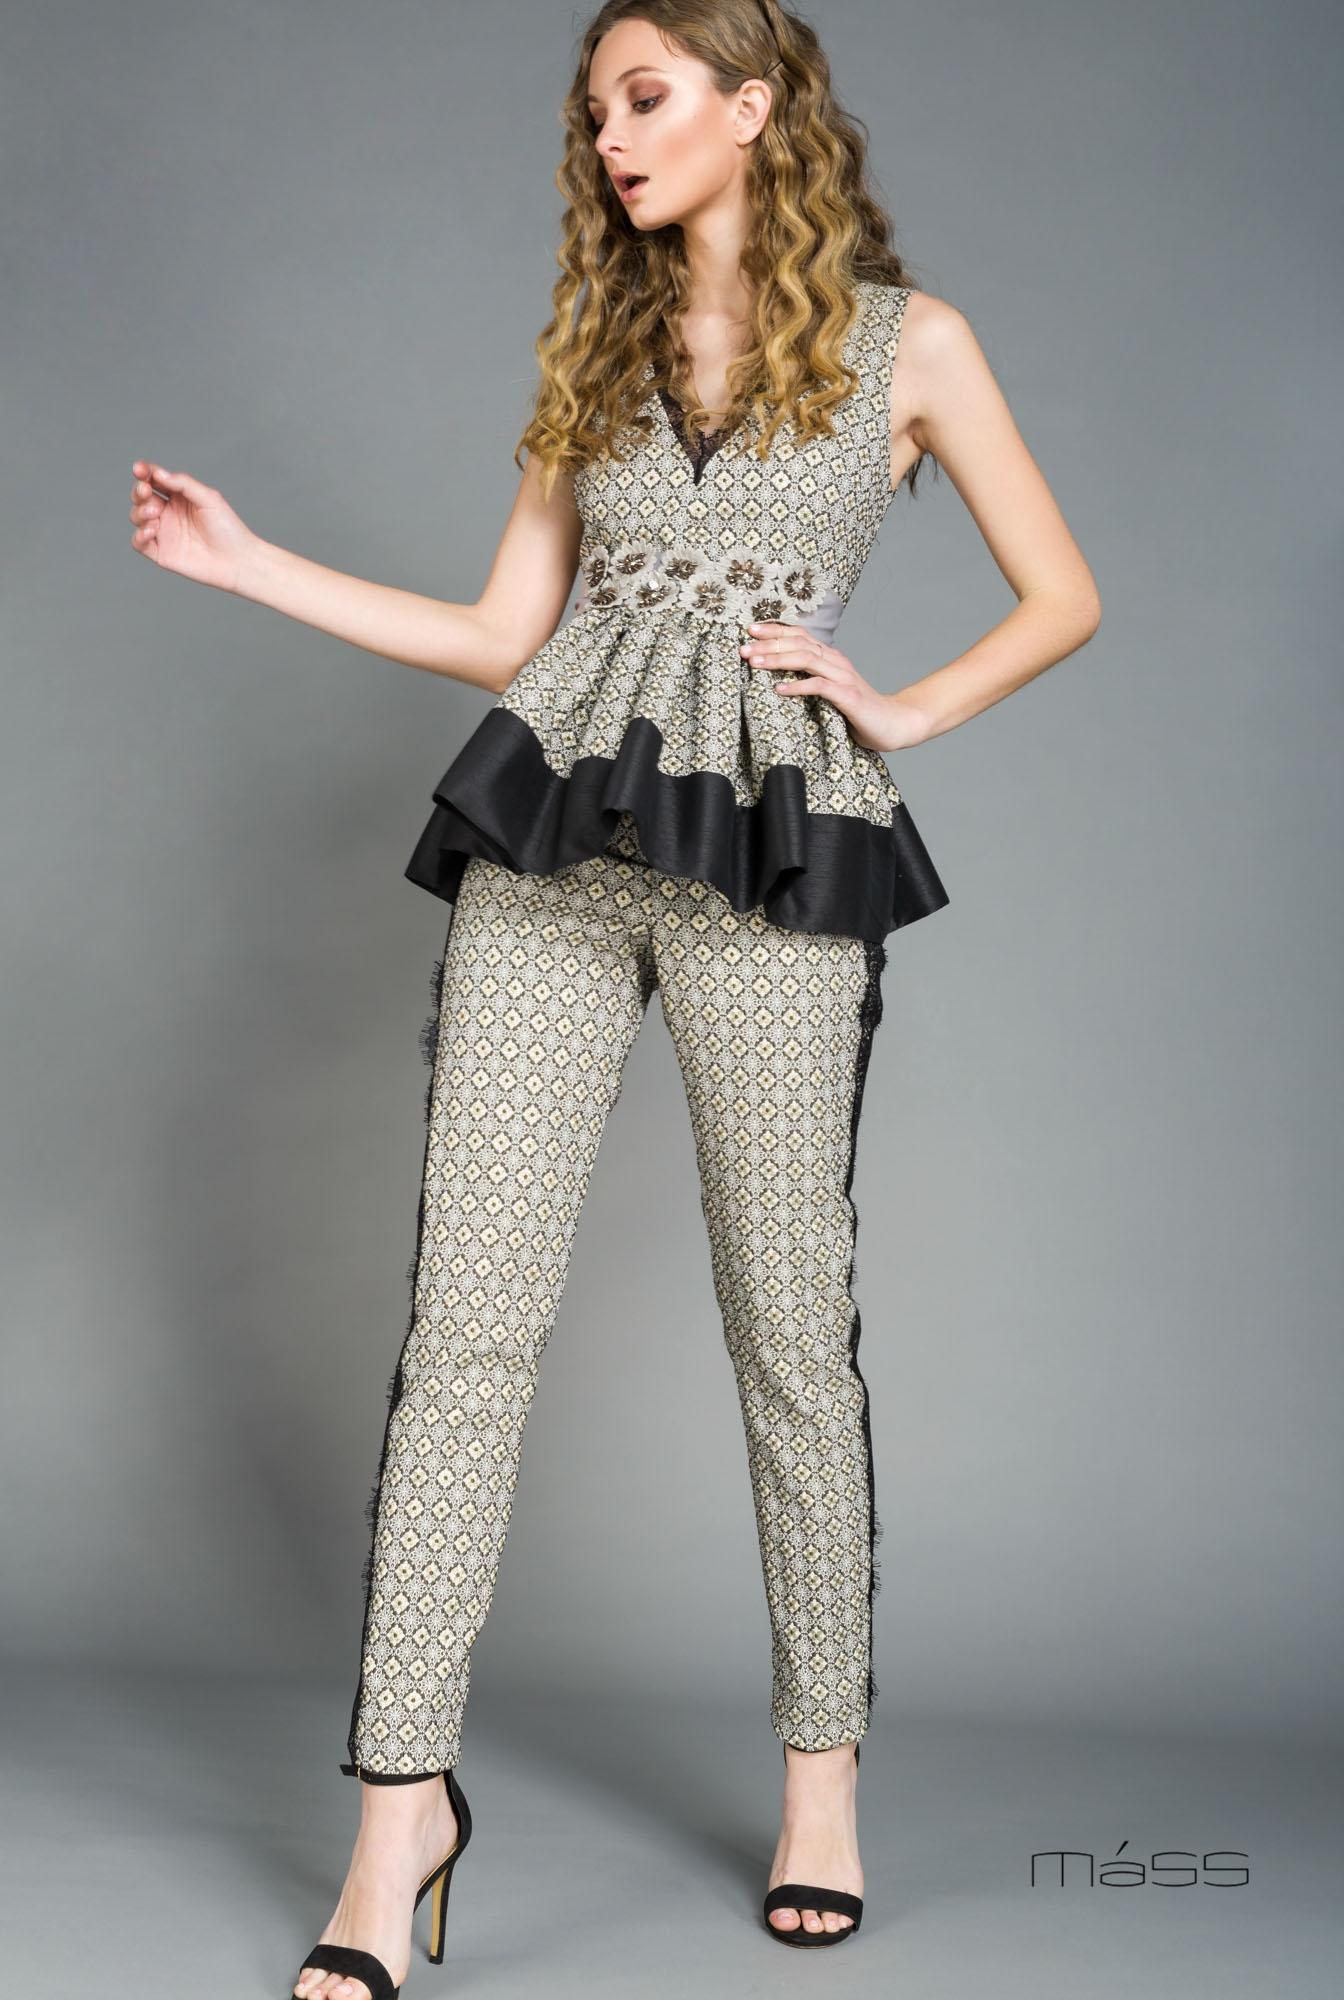 buy popular b8a5a 4bb14 Completo donna 2 pz. pantalone da cerimonia.